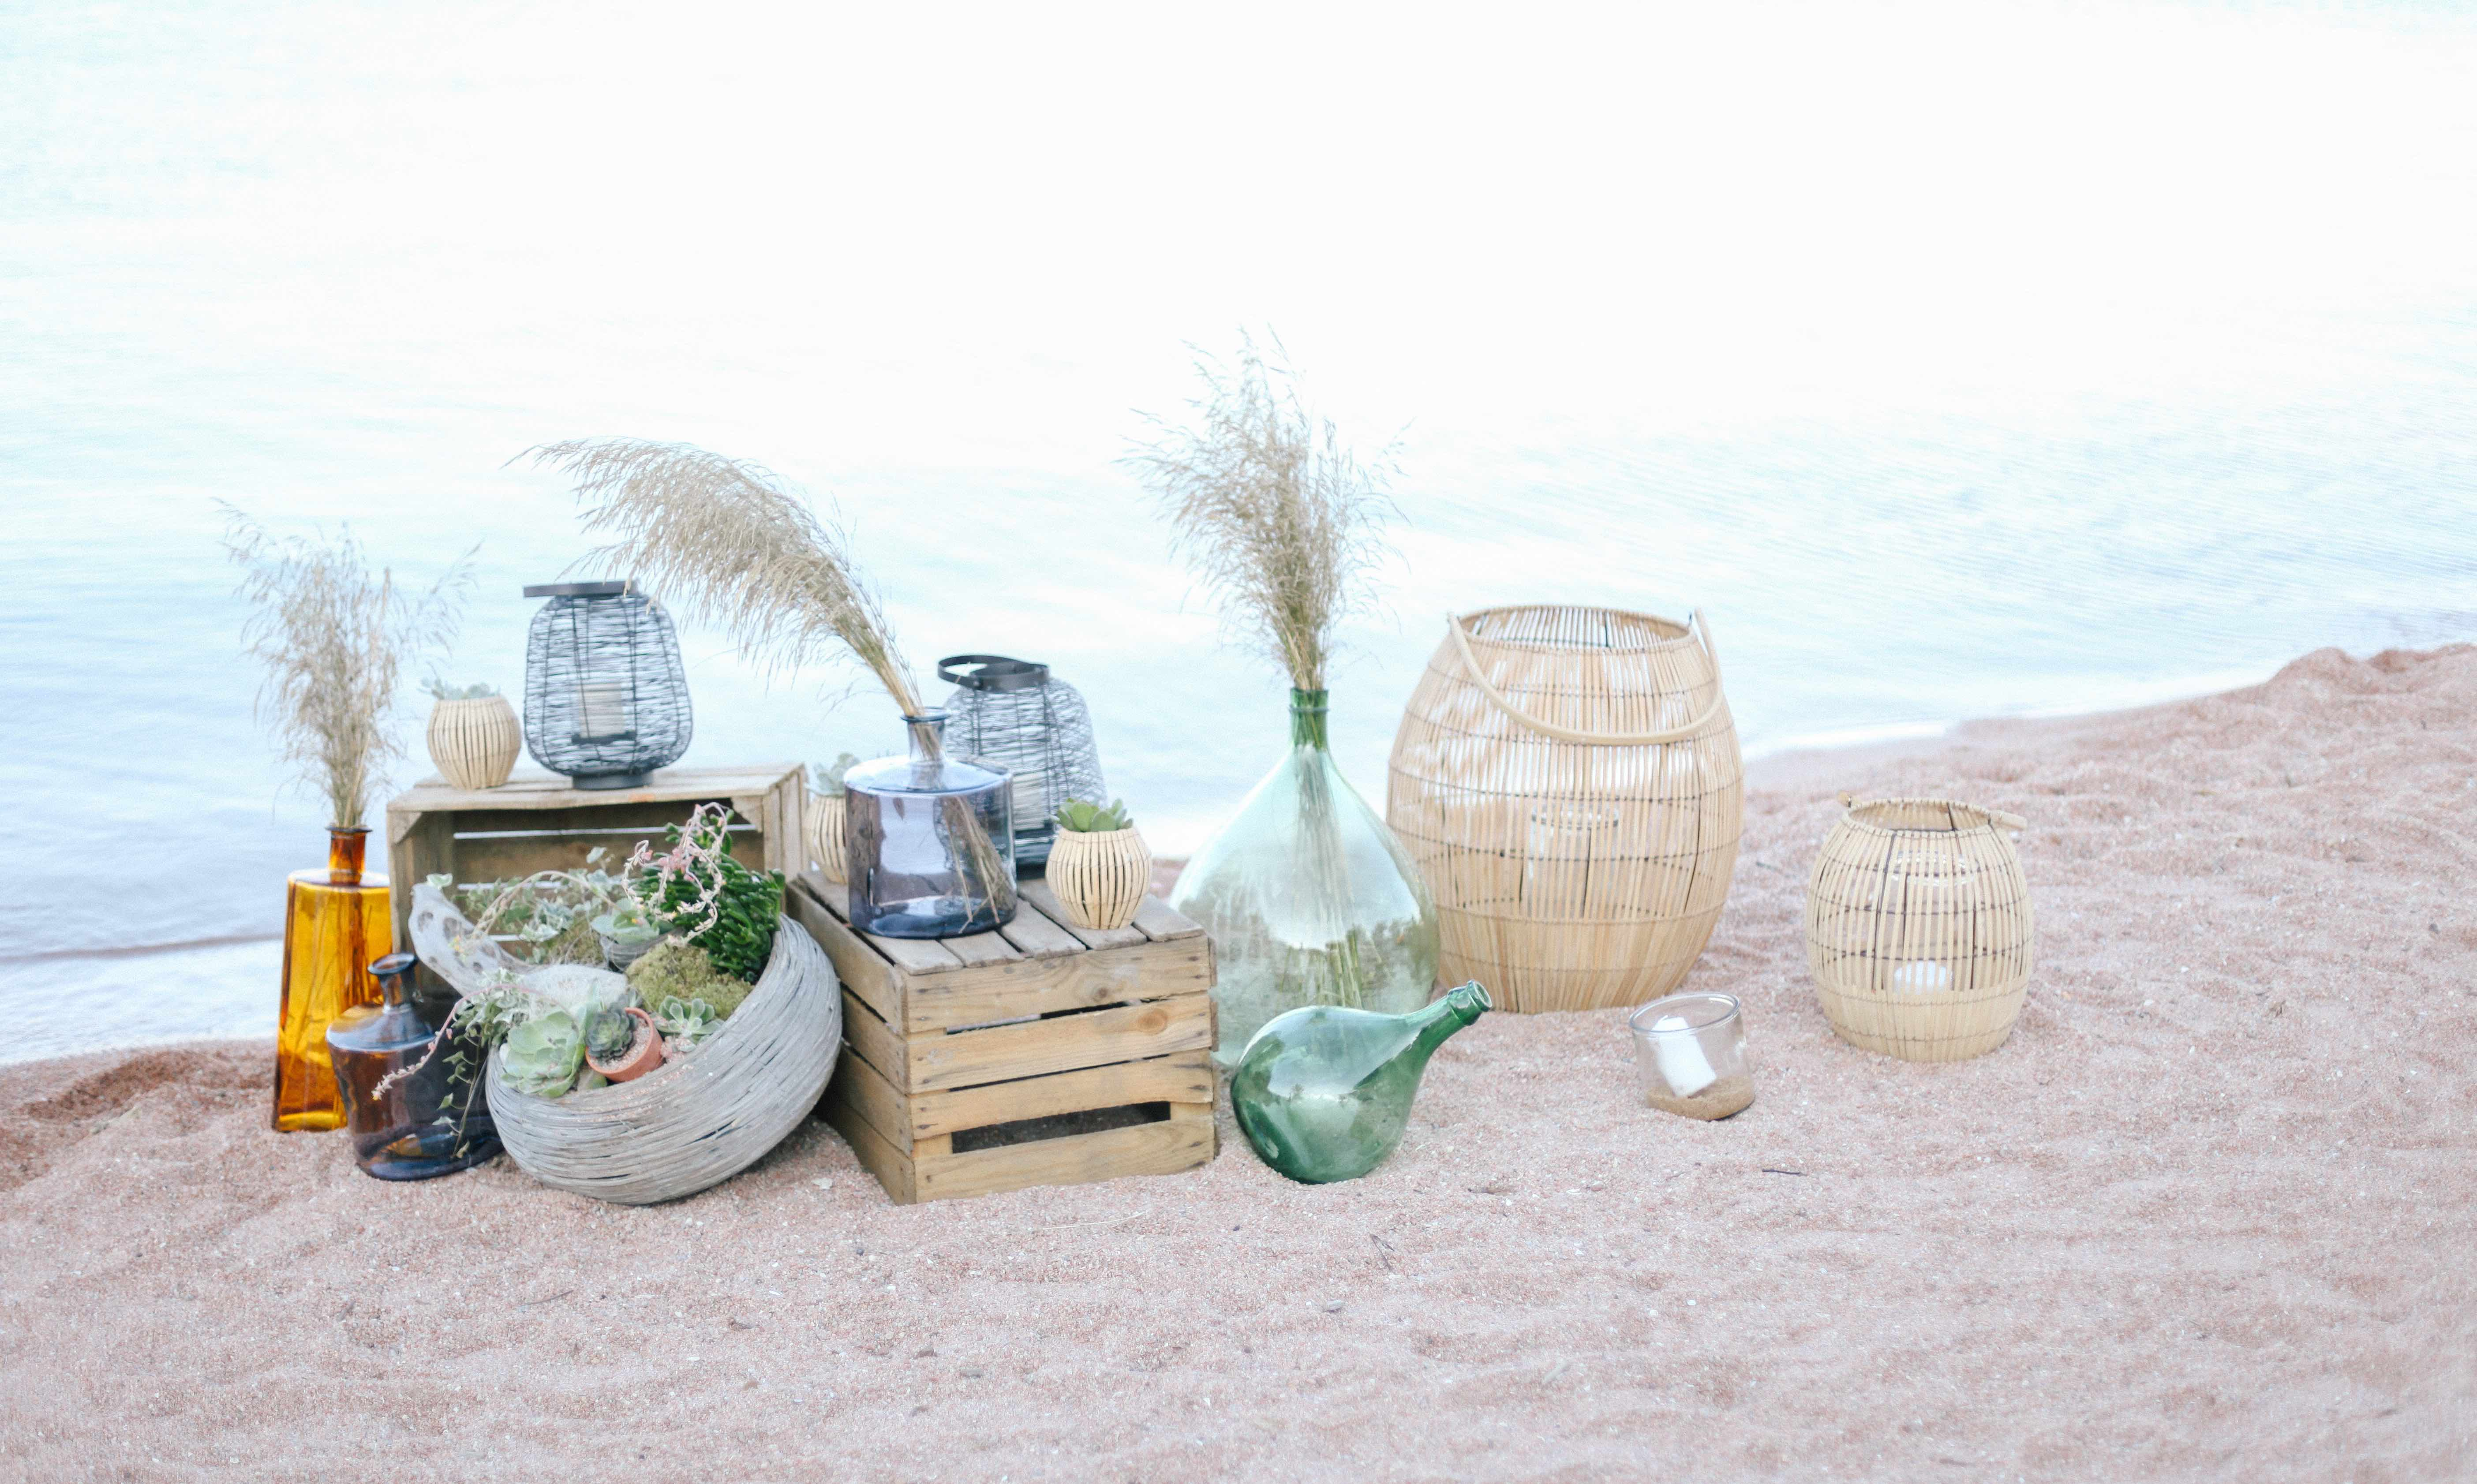 lantern and bottles on the beach